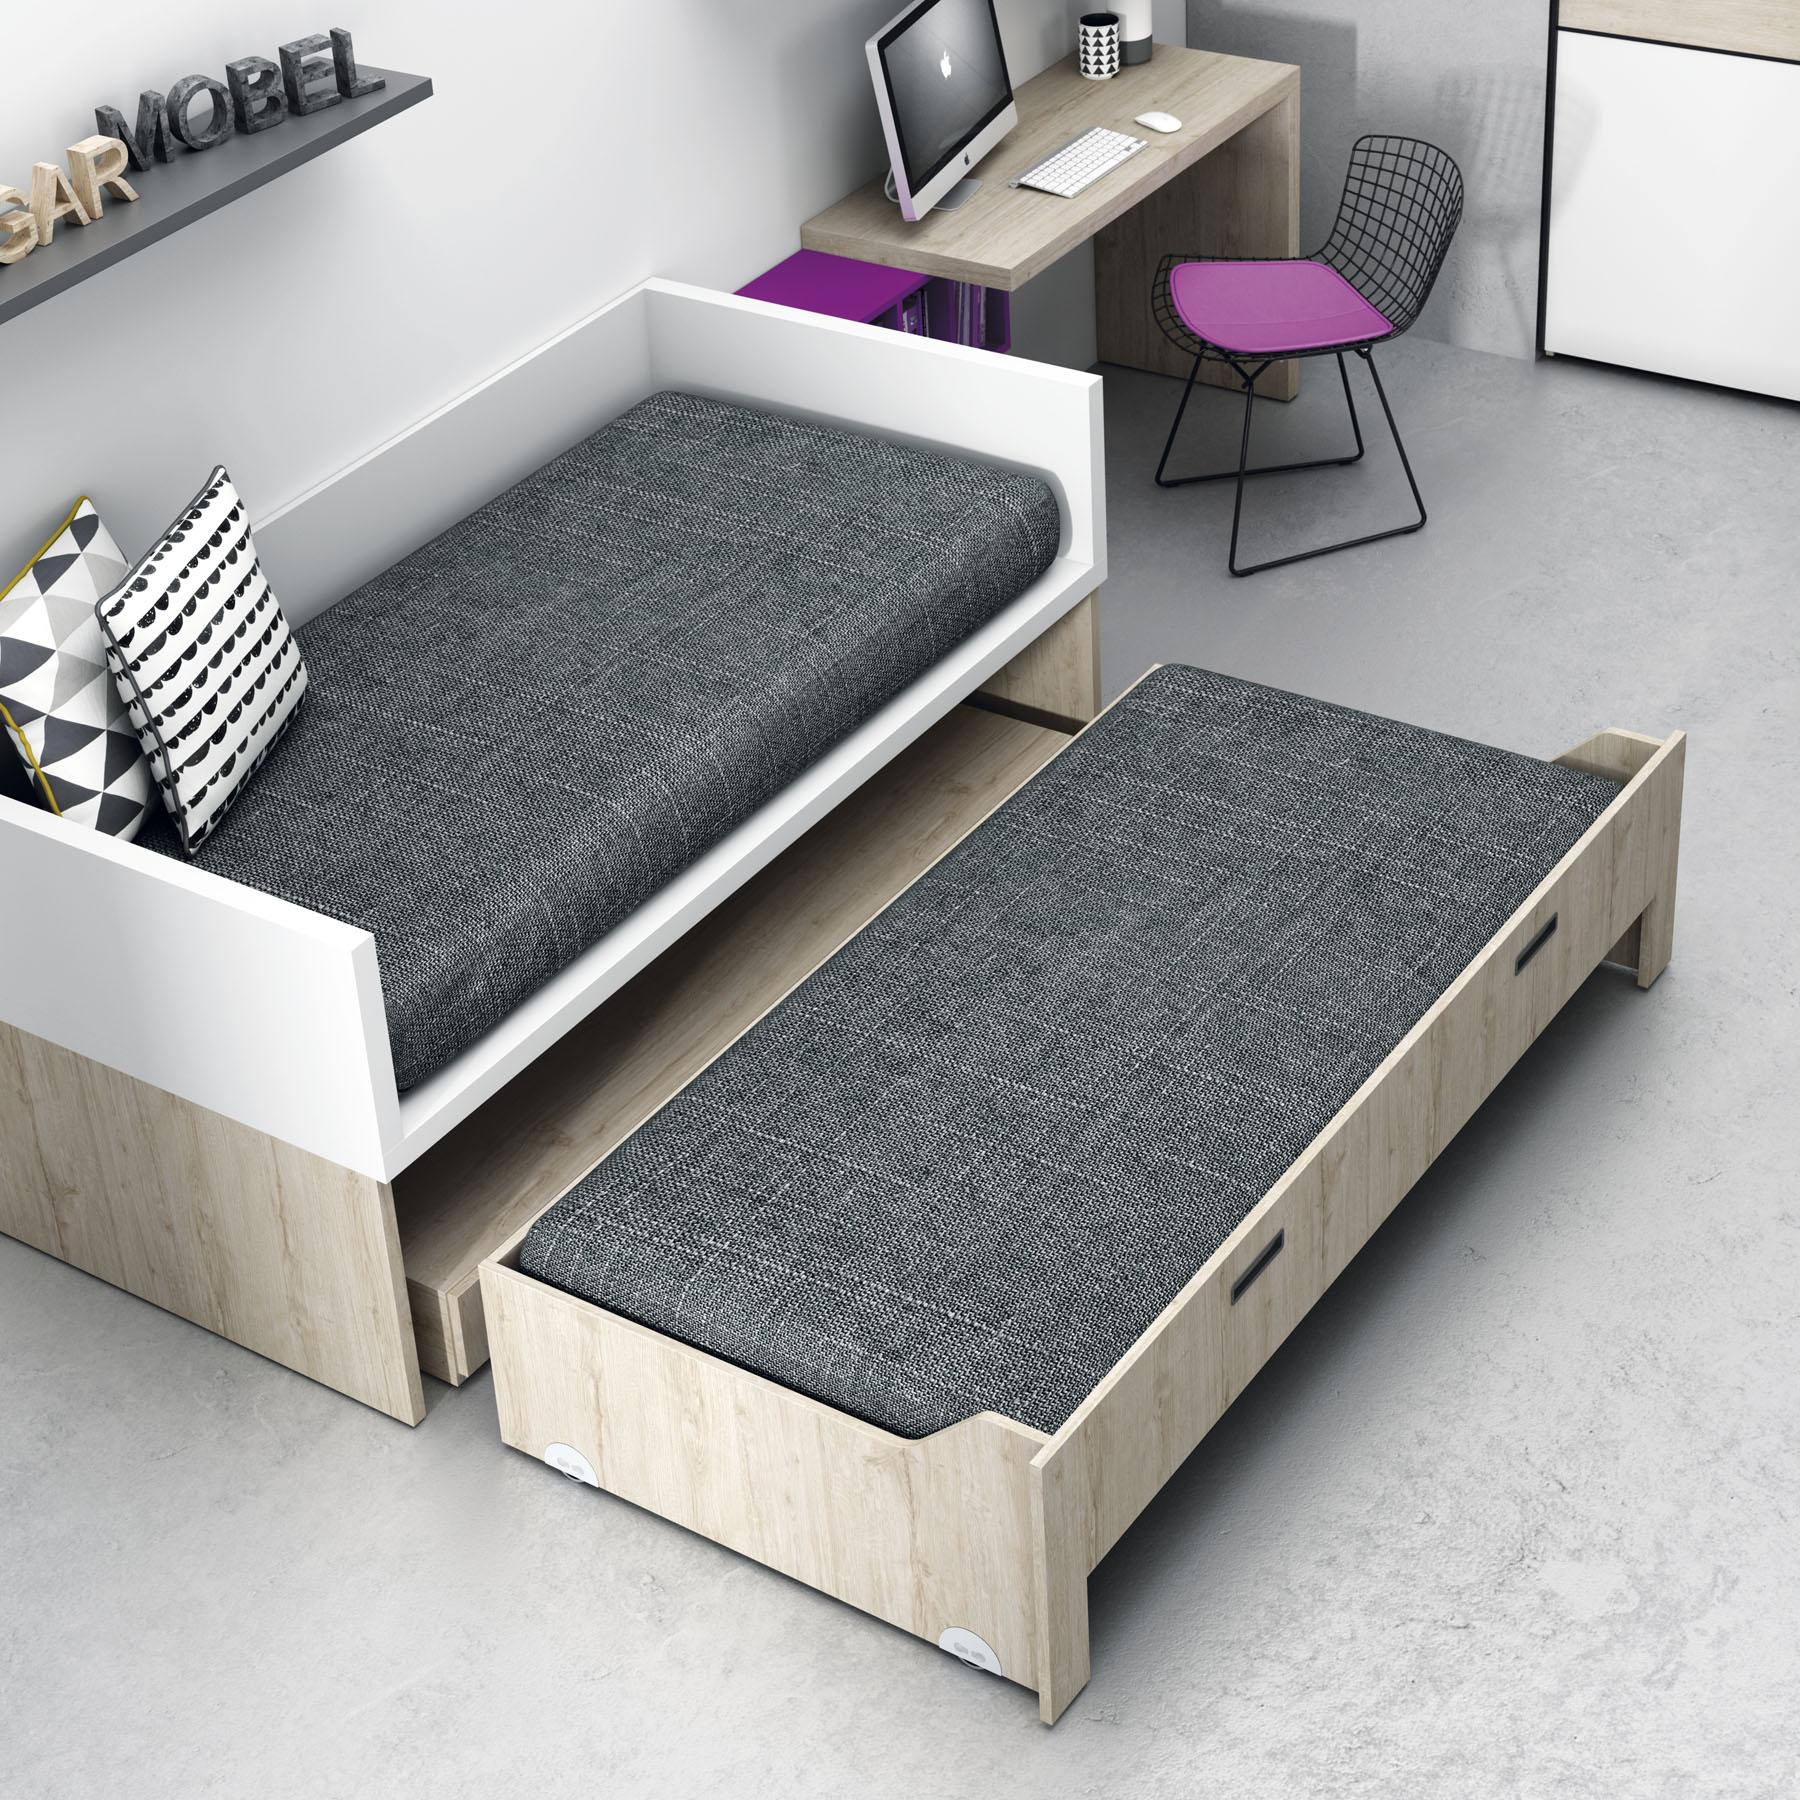 Compactos camas nido qb tegar for Camas infantiles dobles